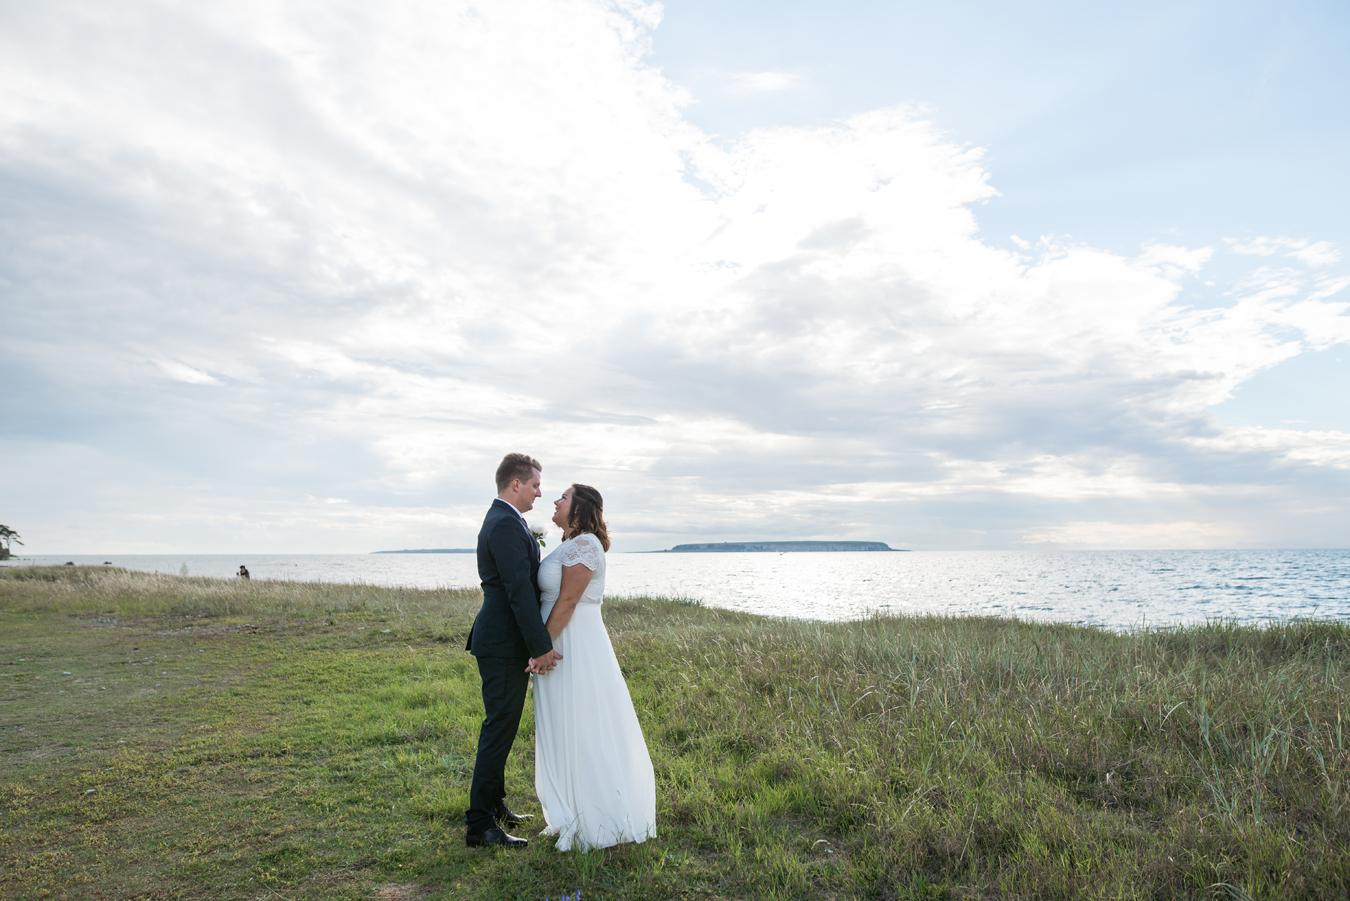 117-bröllopsfotograf-gotland-ekstakusten-neas-fotografi.jpg